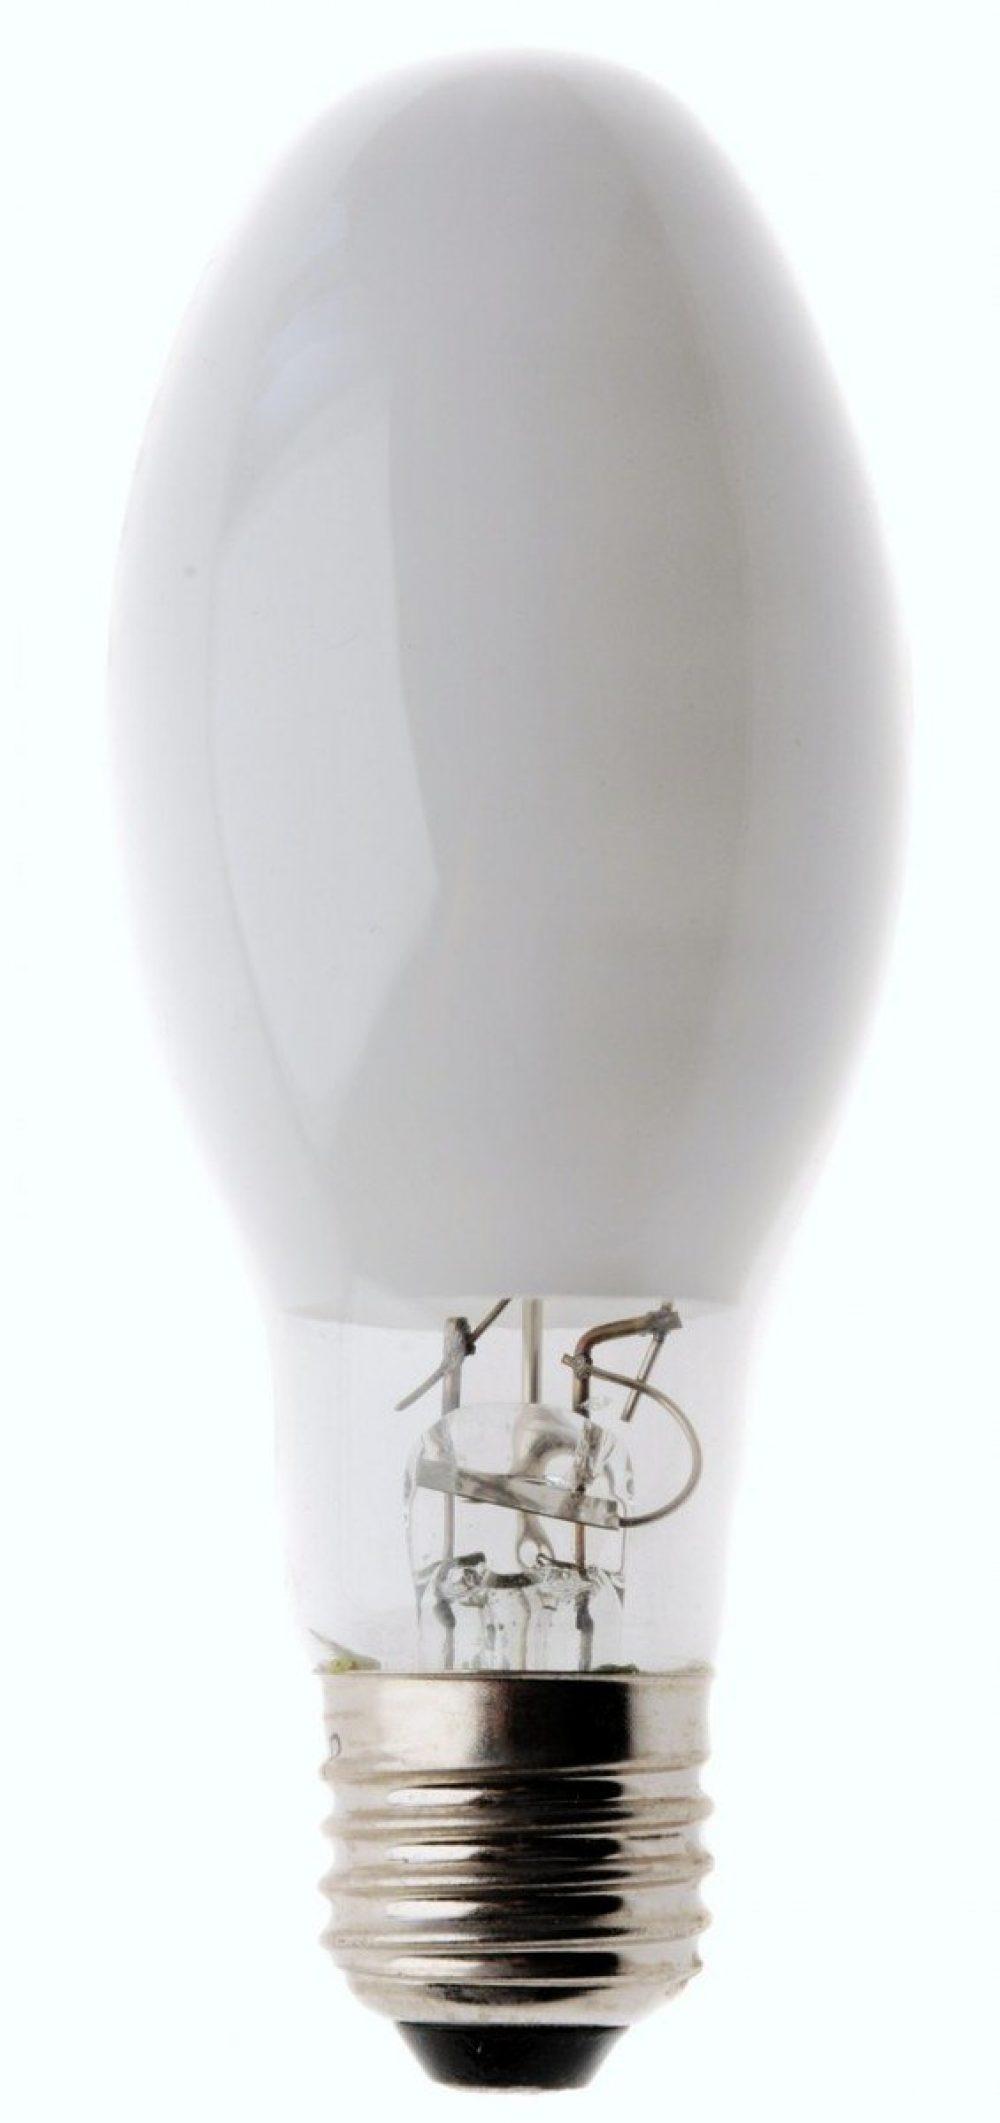 HID Metal Halide Lamps MH400W/ ED120/ C/ U/ 4K/ E40/ COATED/ EUROPE/ HPI